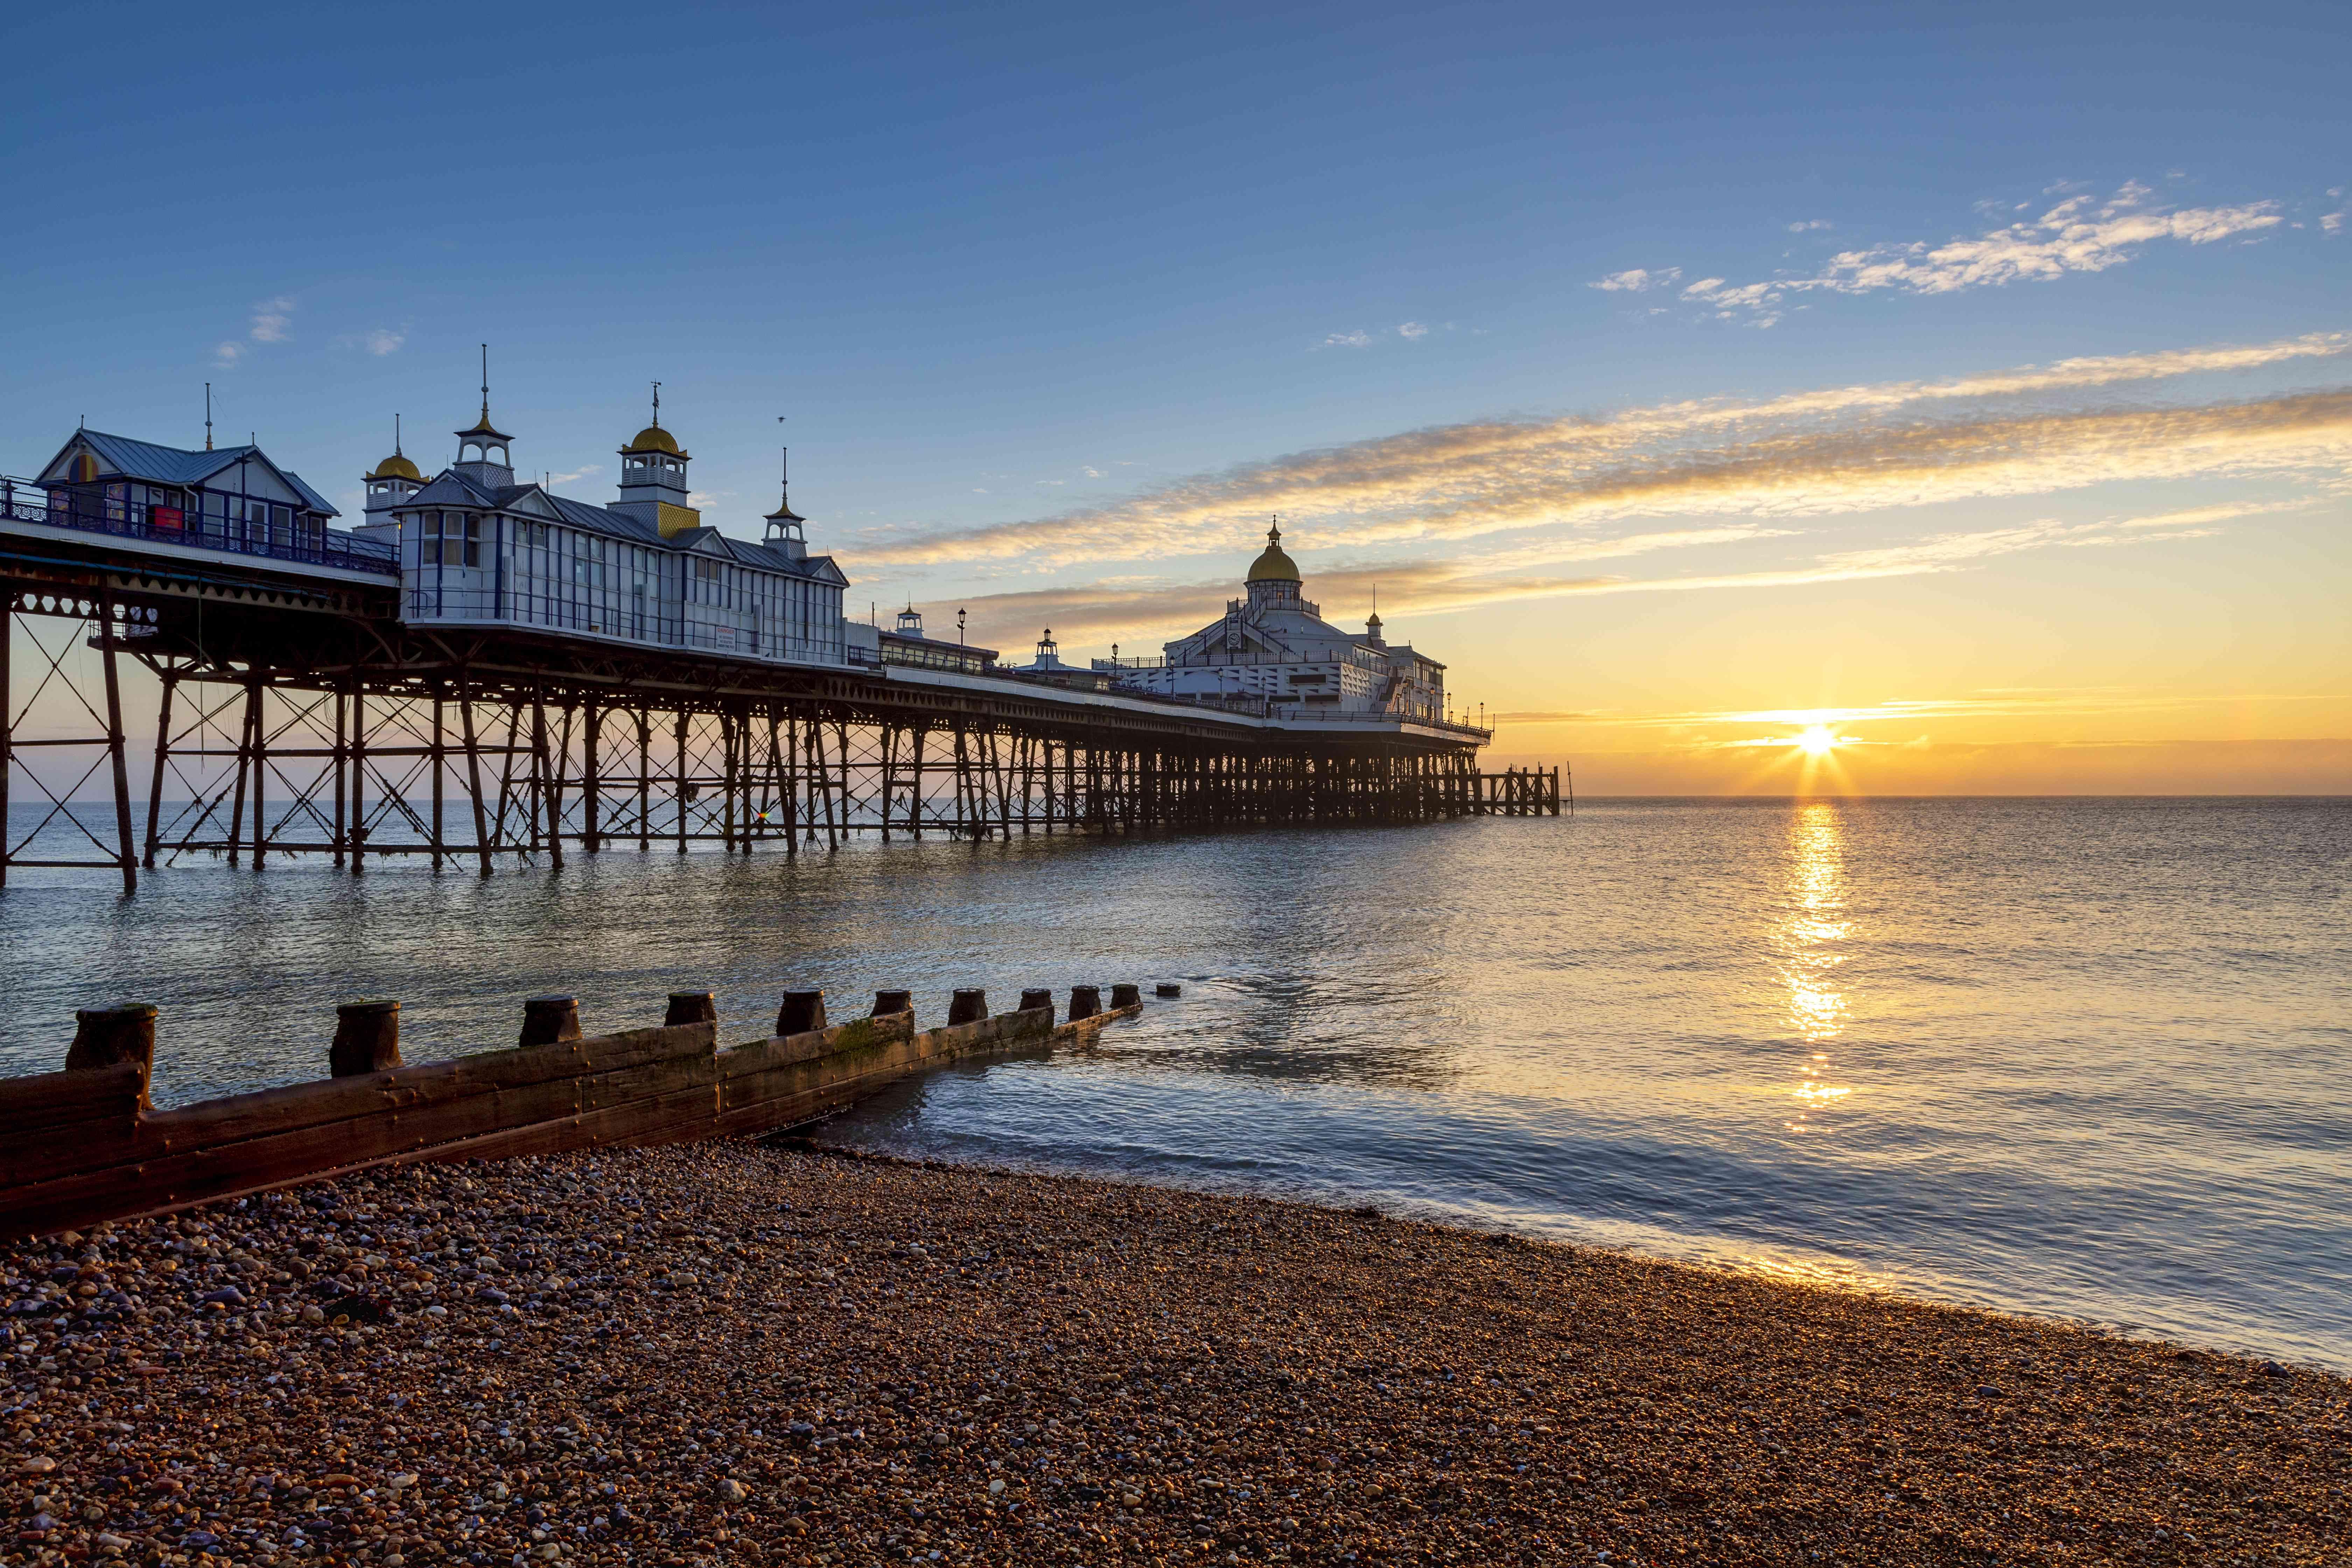 Eastbourne Pier at sunrise.